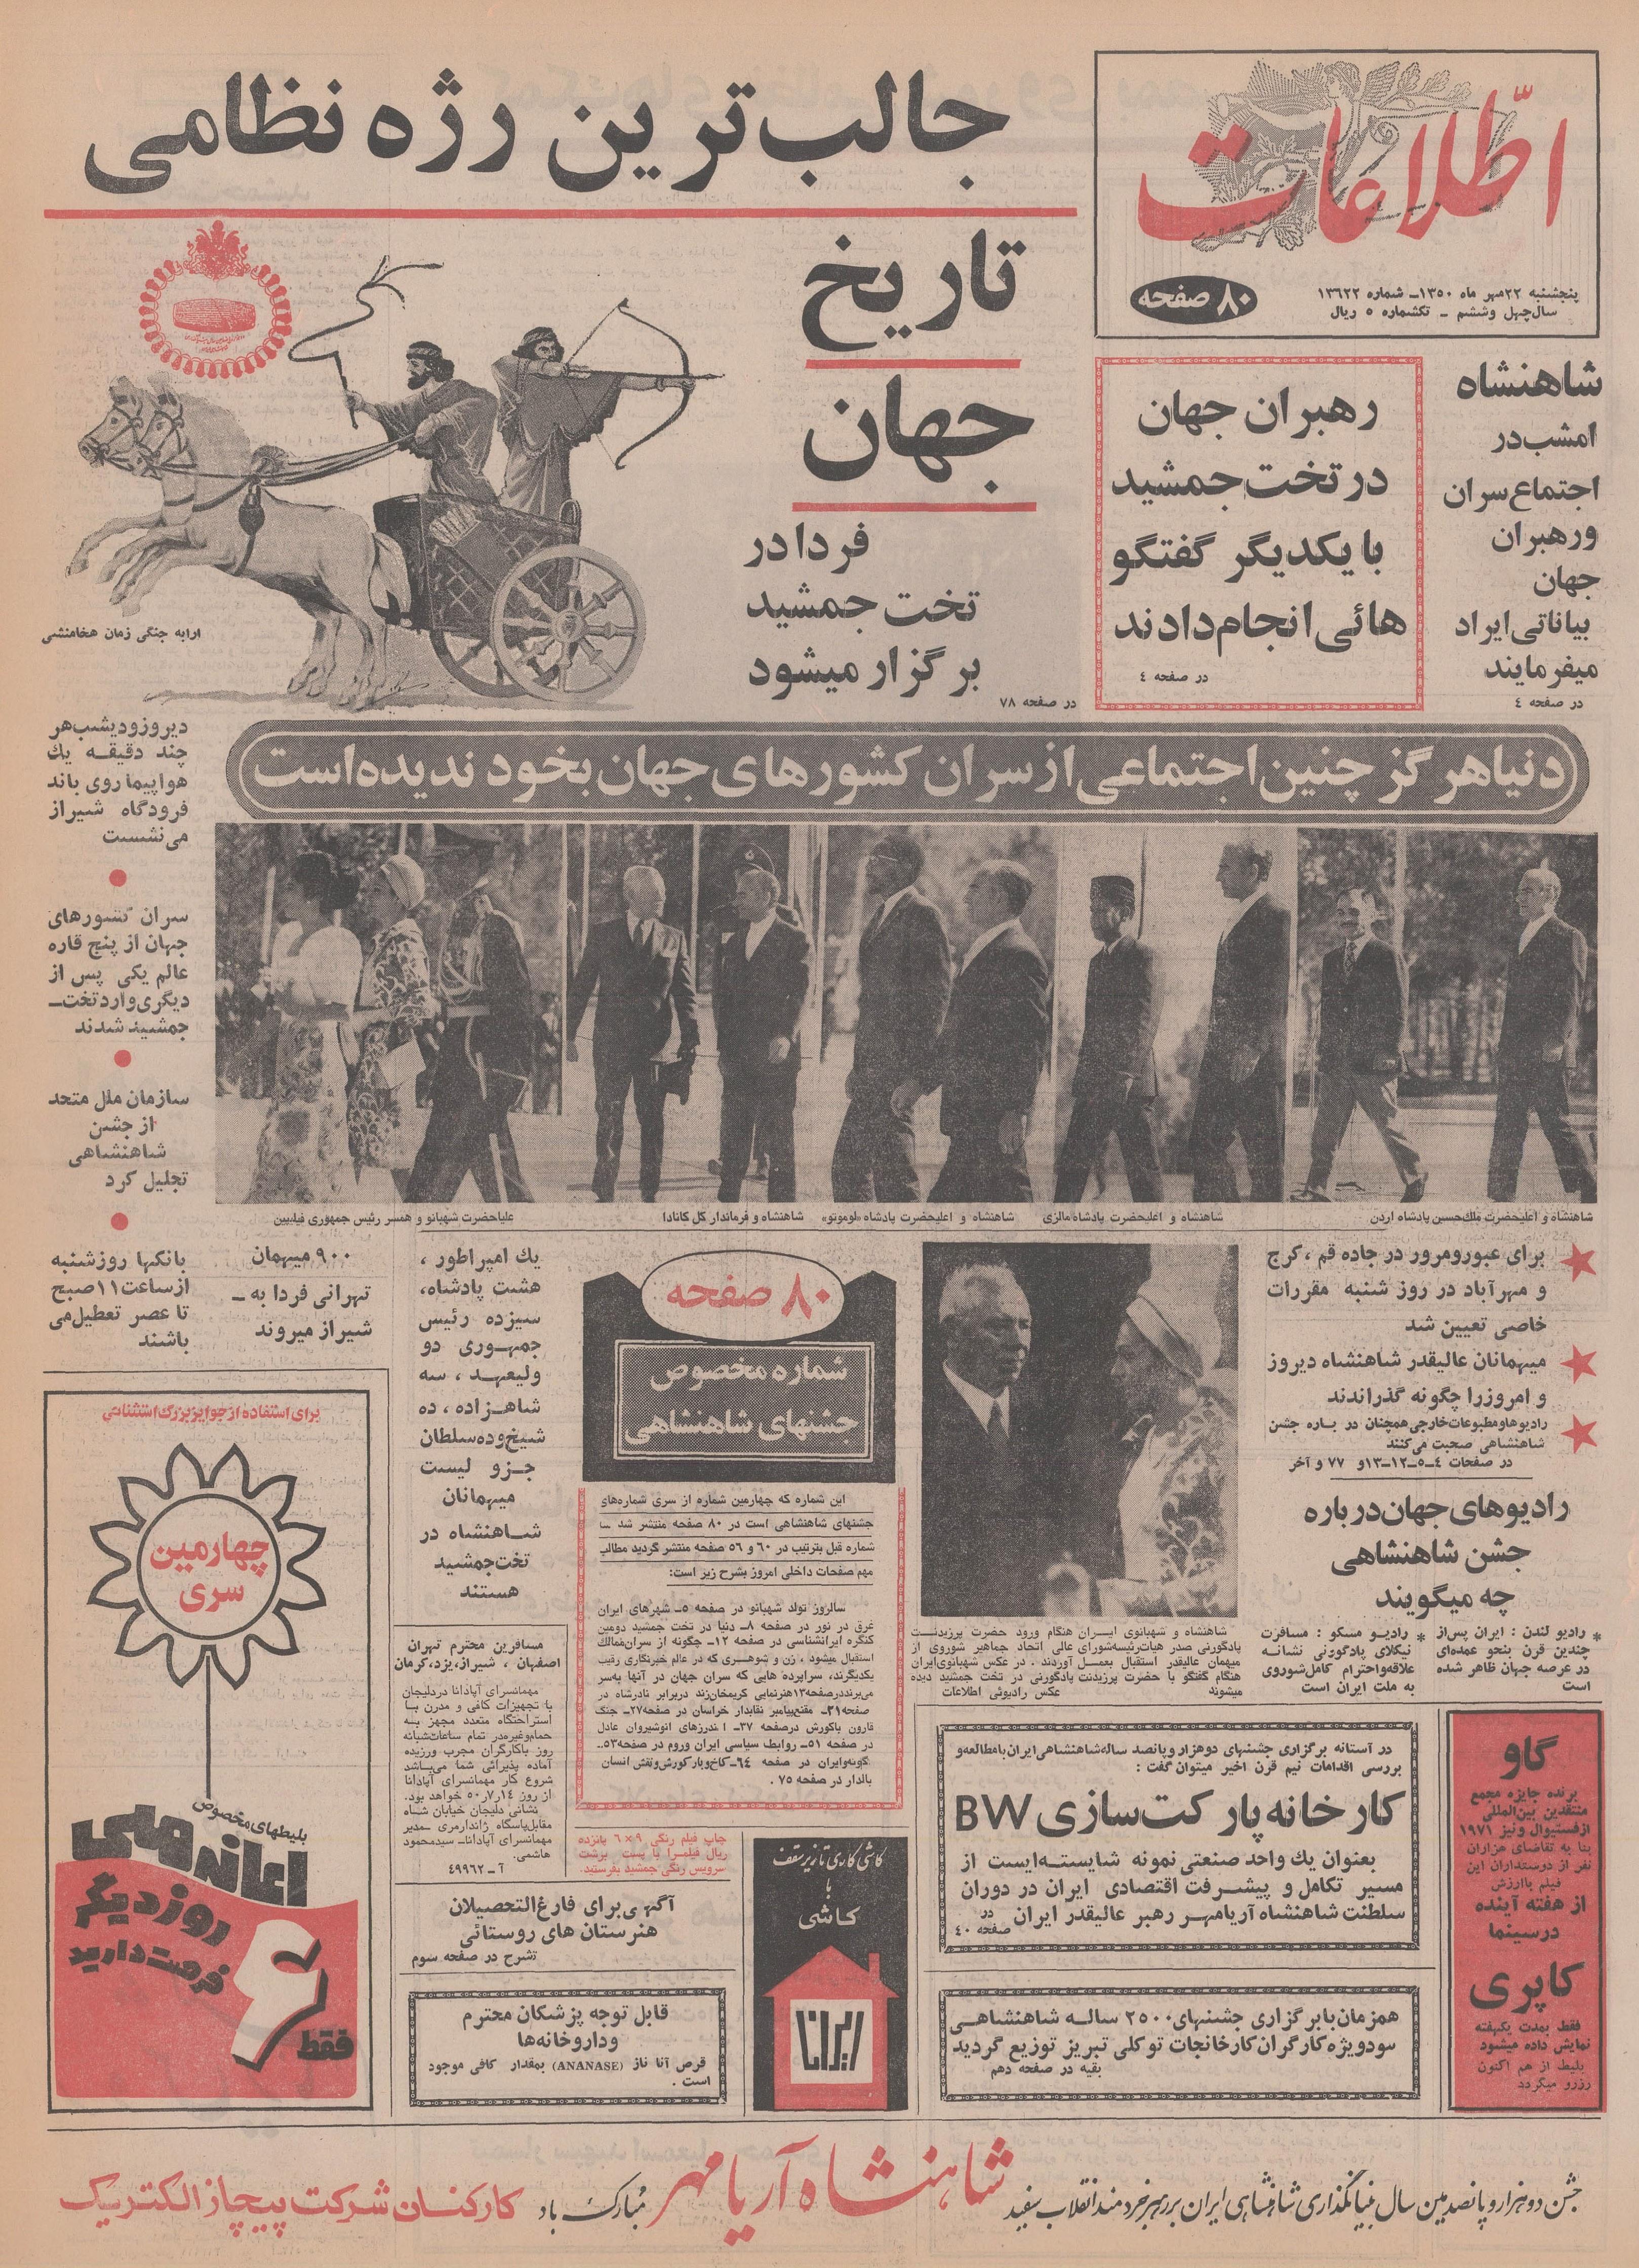 اطلاعات 22 مهر 1350